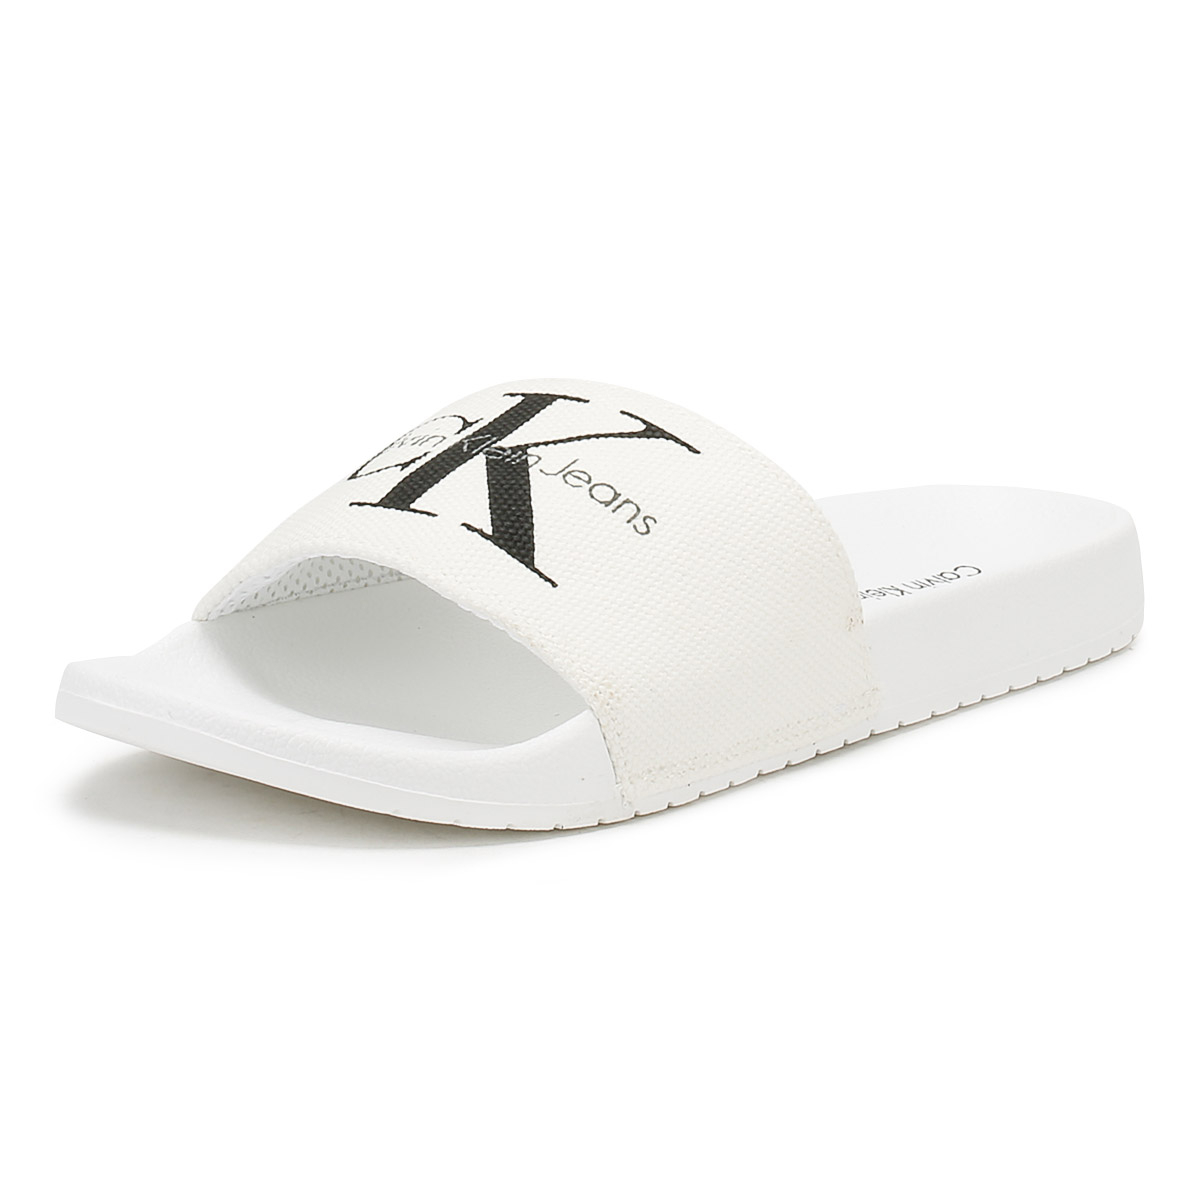 ab4c042bf Details about Calvin Klein Jeans Mens White Viggo Slides Summer Flip Flops  Beach Shoes